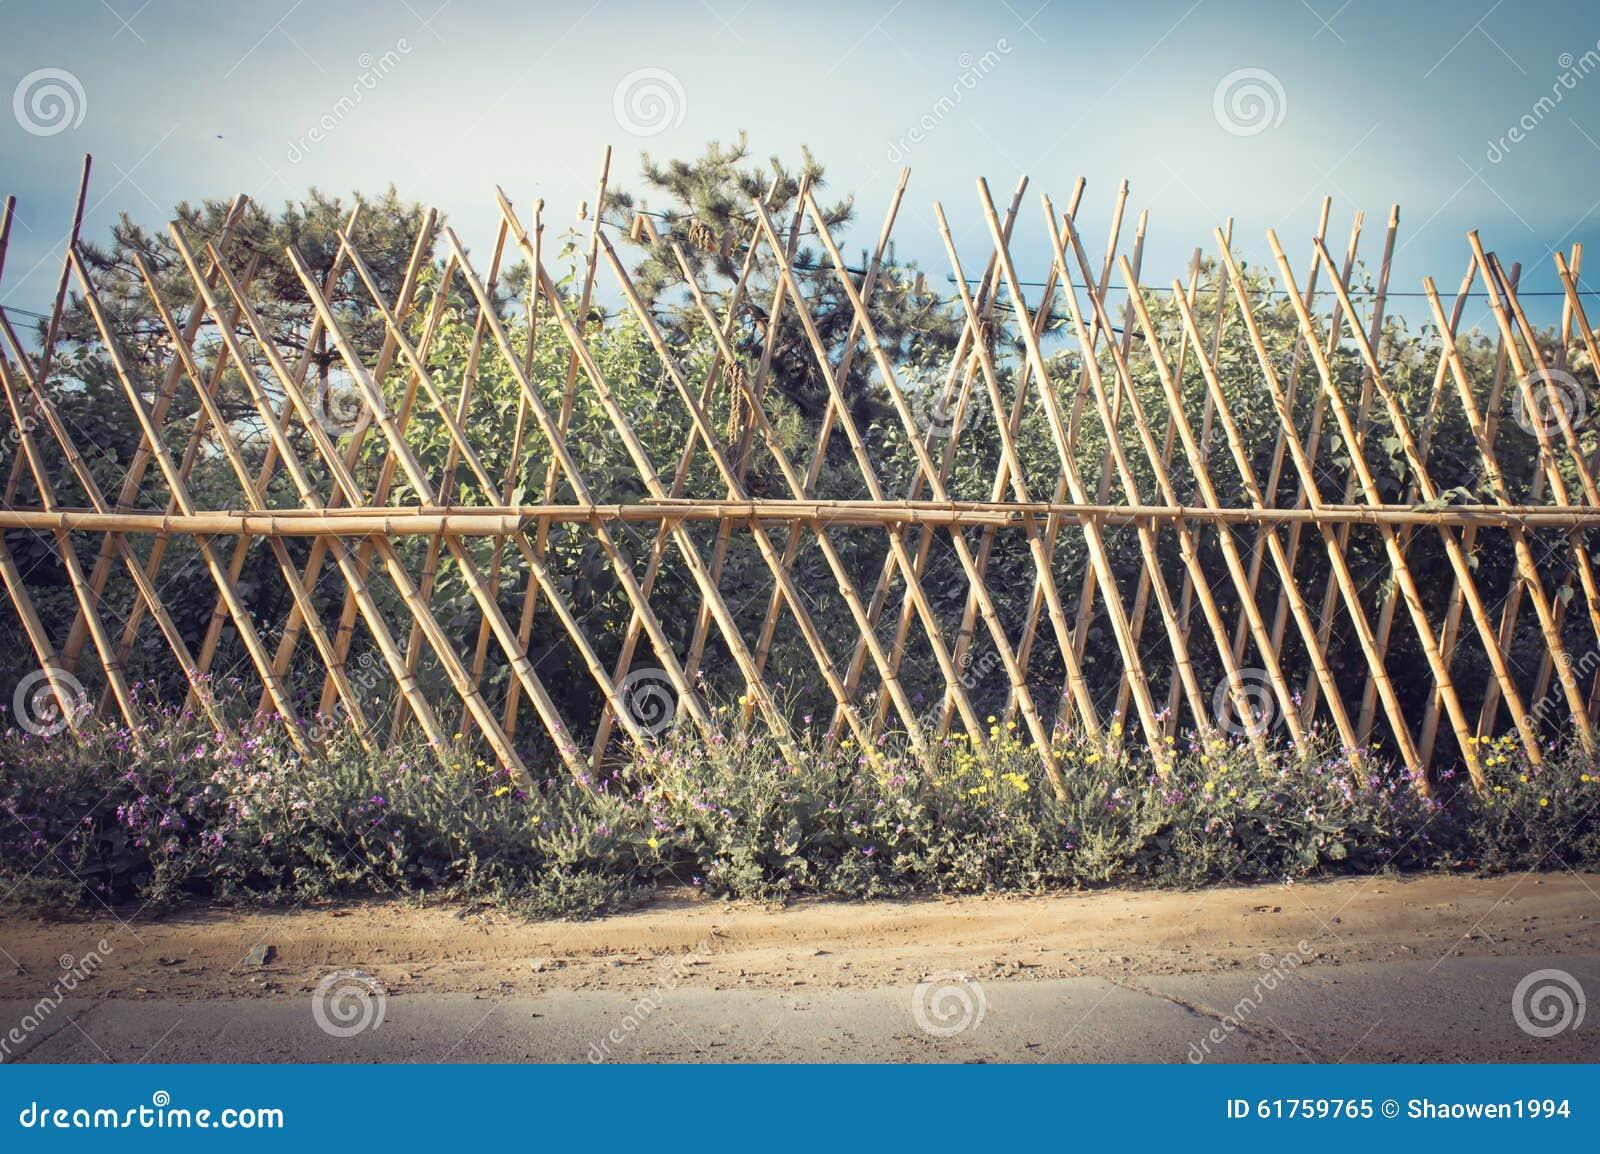 Barrière en bambou 3 image stock. Image du bambous, roadside - 61759765